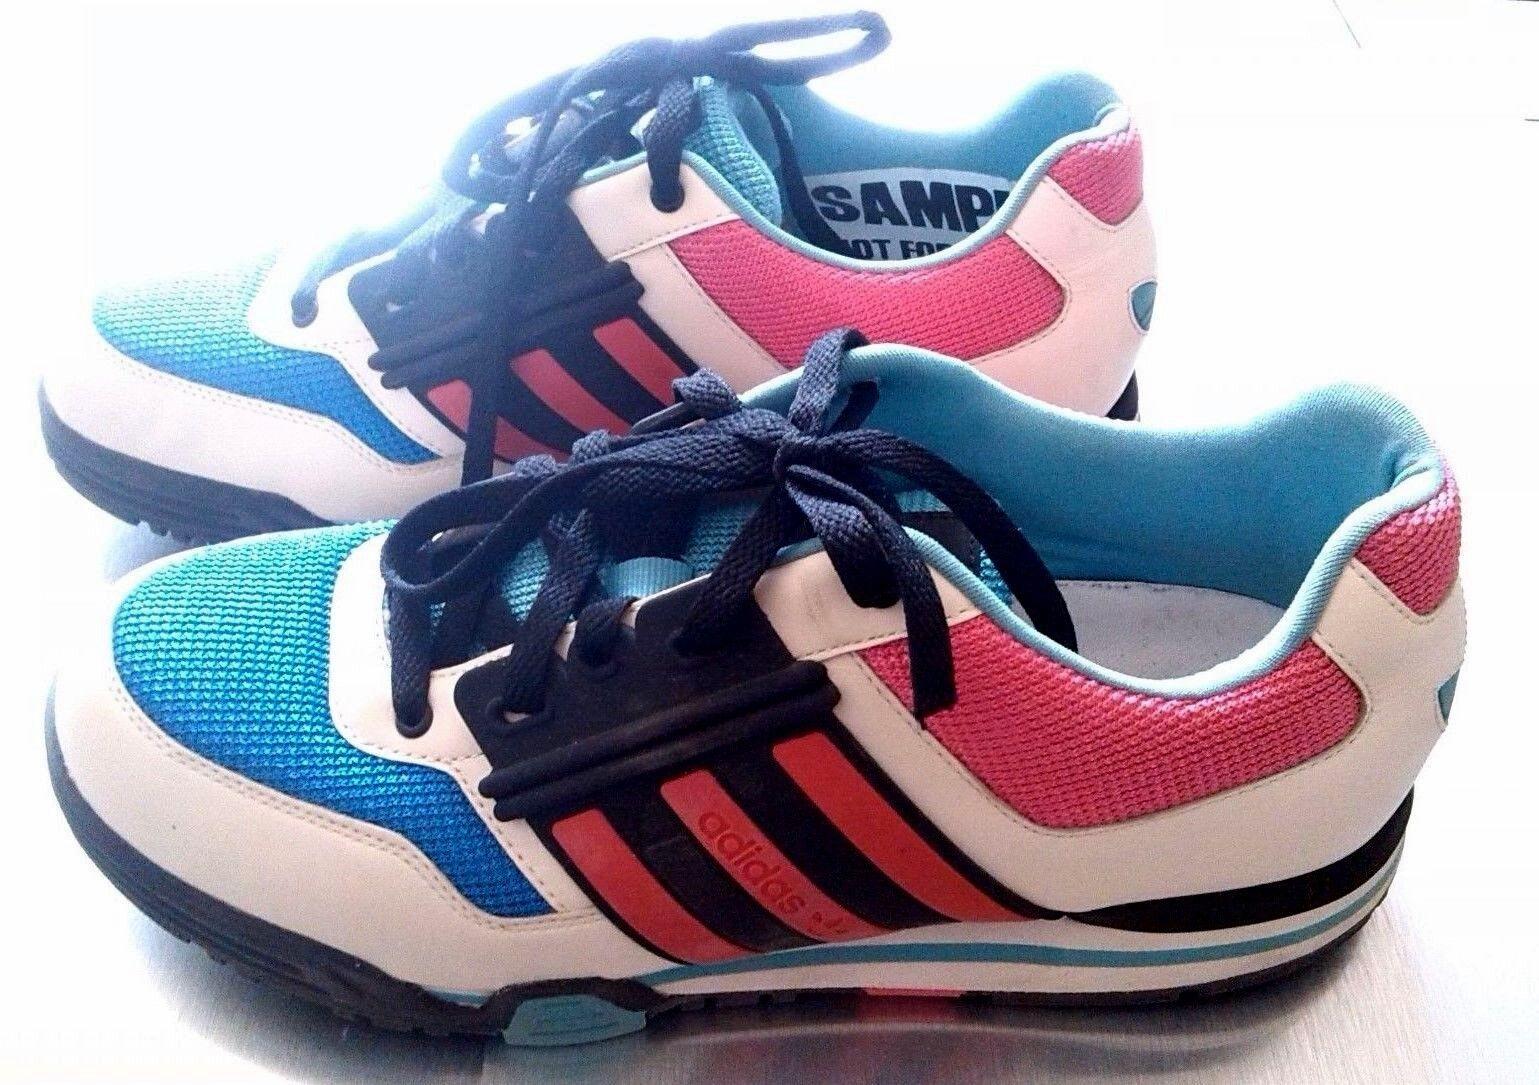 Adidas SAMPLE  Sneaker 9 9 9 / 8.5 Turnschuhe 42 2/3 Schuhe Design Turnschuhe 6e507c